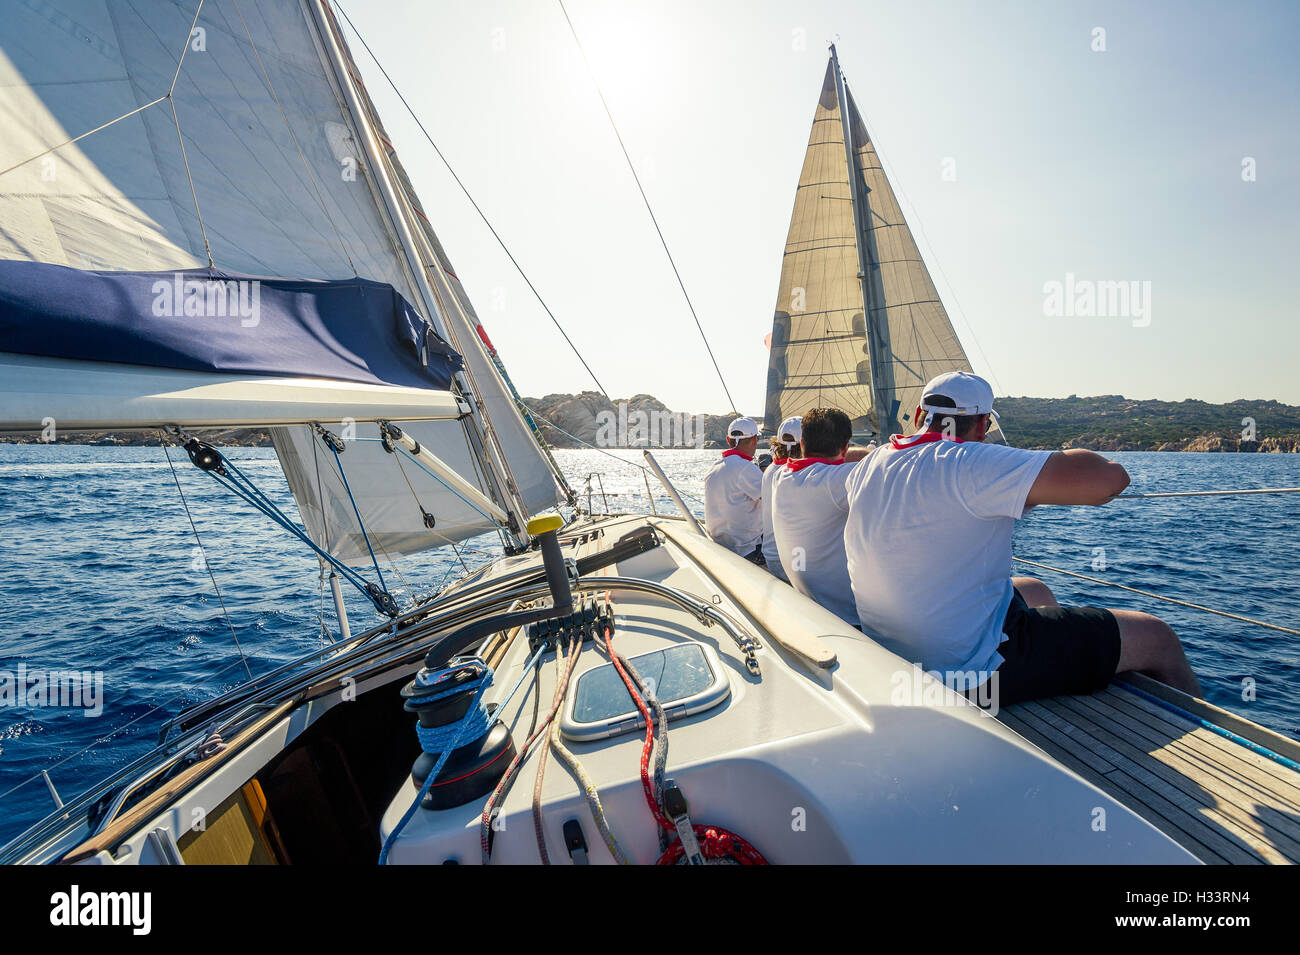 Sailing regatta on charter cruising boats - Stock Image